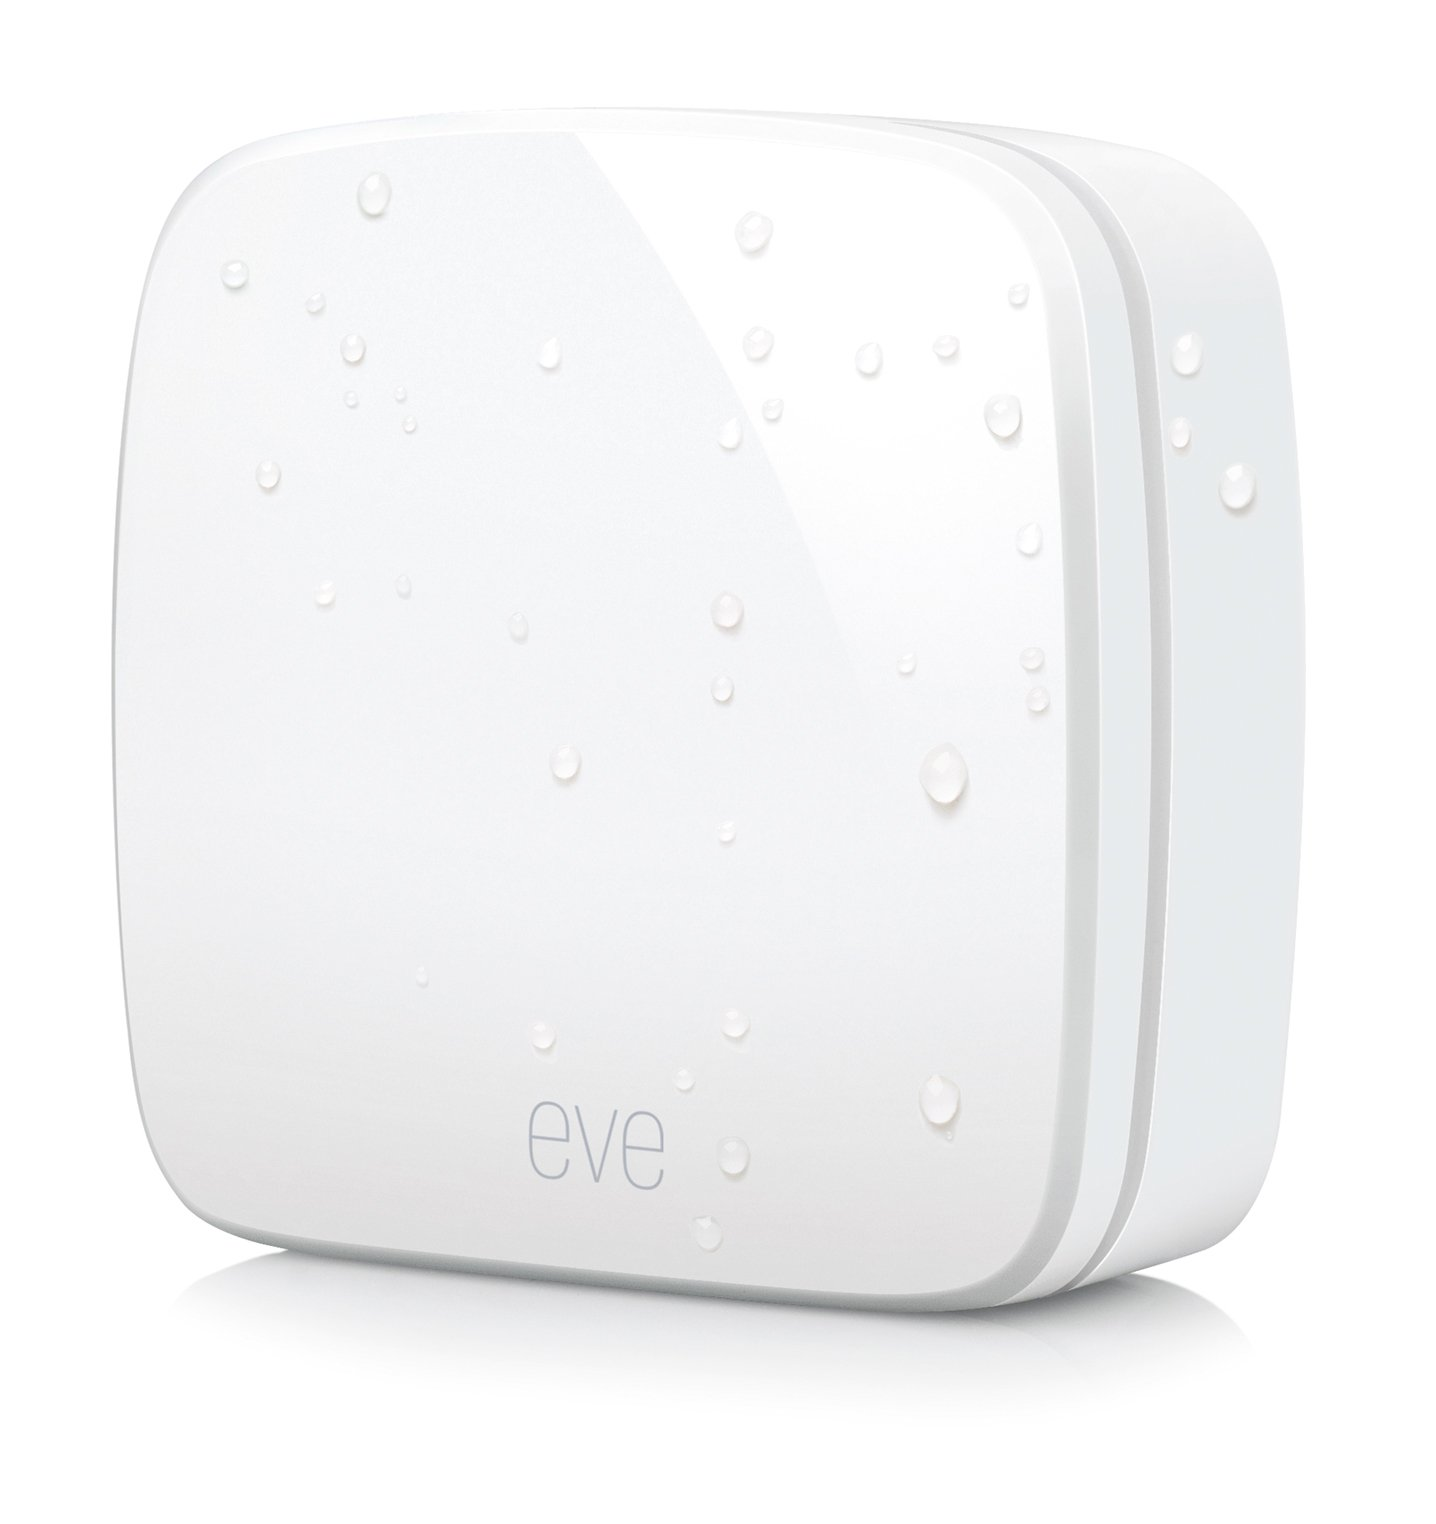 Elgato Eve Weather - Wireless Outdoor Sensor, Bluetooth Low Energy